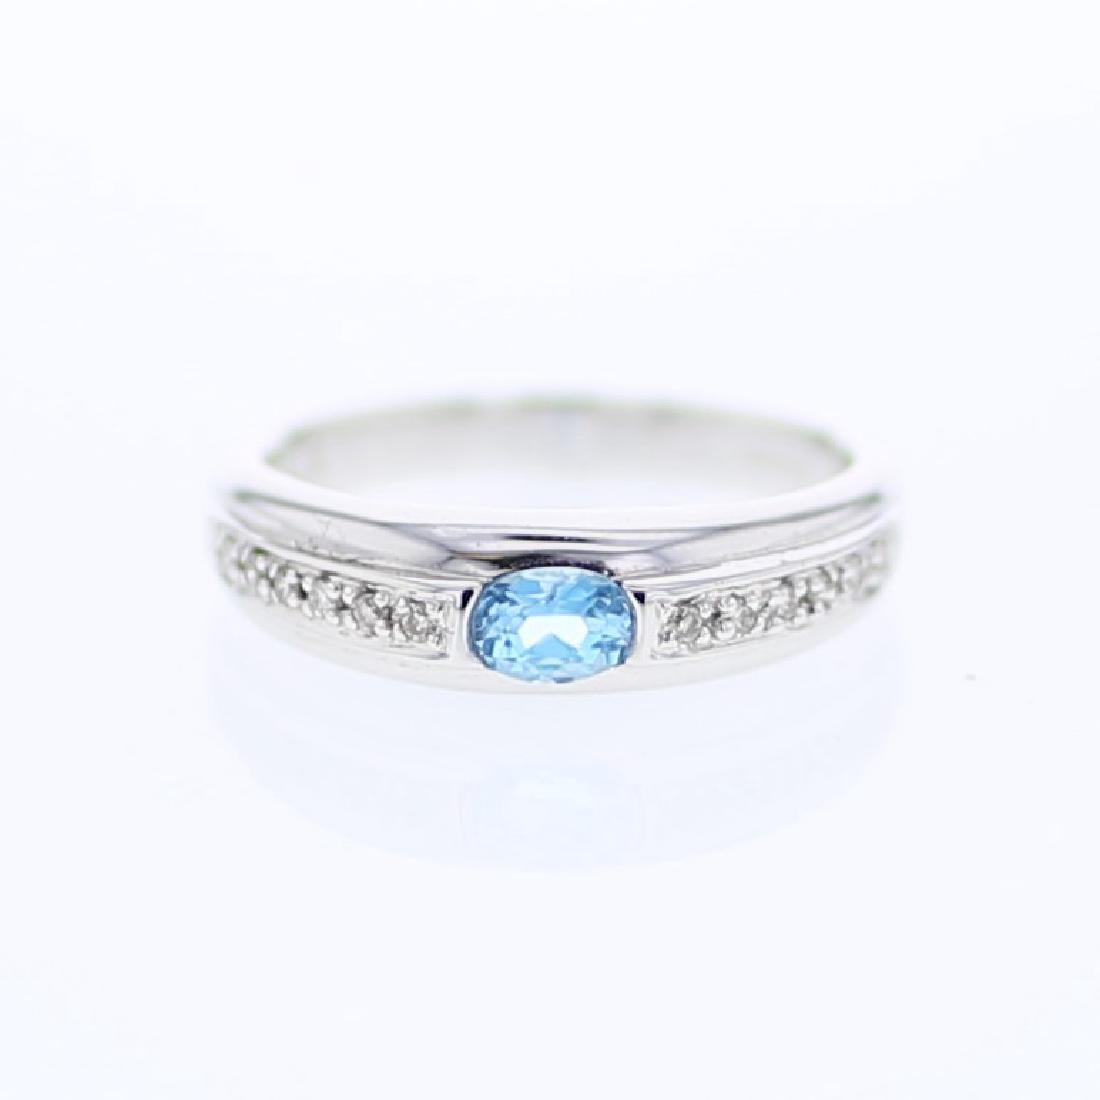 14KT White Gold 0.34ct Blue Topaz and Diamond Ring